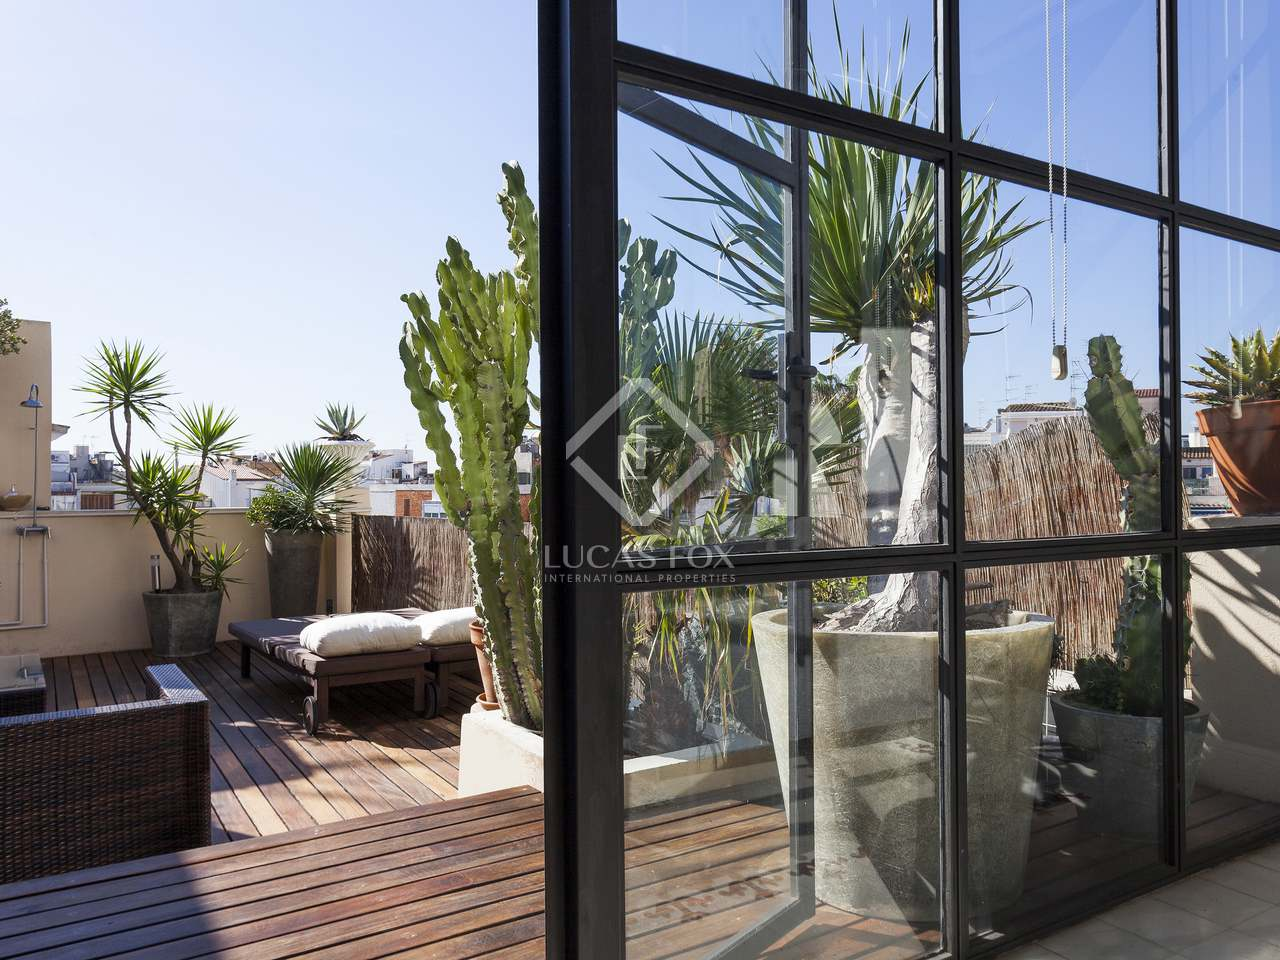 Apartamento de 116m con terraza de 30m en venta en sitges for Terrazas 1280 a